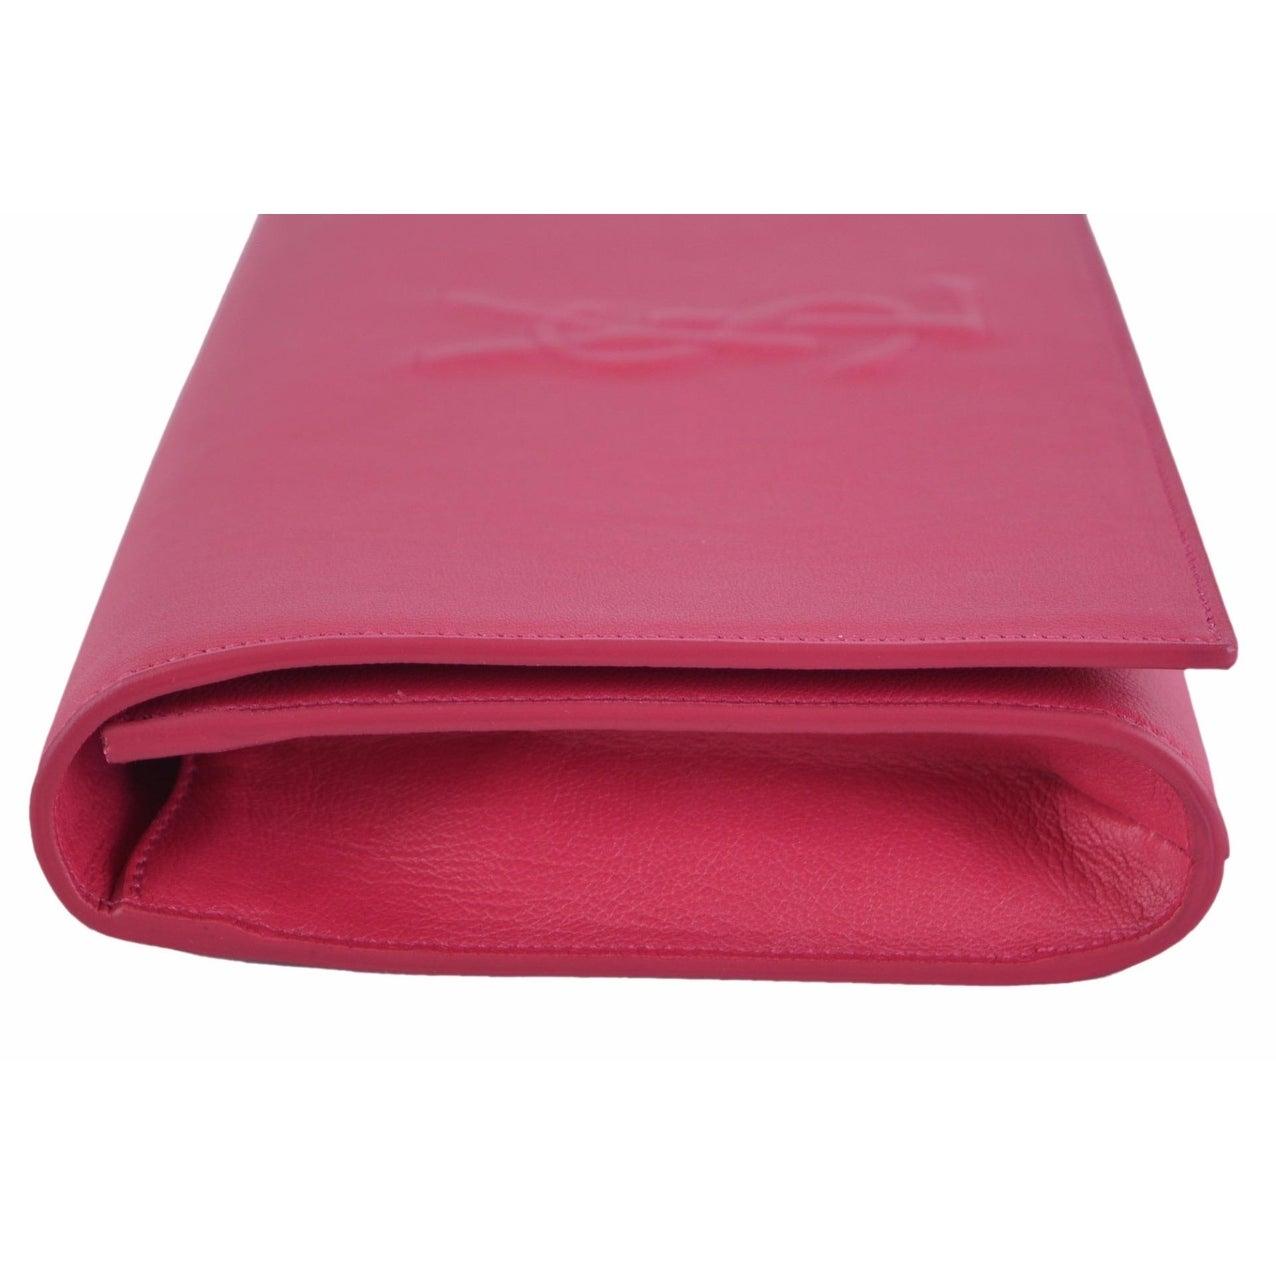 4a68d7fe96349 Shop Saint Laurent YSL 361120 Pink Leather Large Belle de Jour Clutch  Handbag - On Sale - Free Shipping Today - Overstock - 12072565